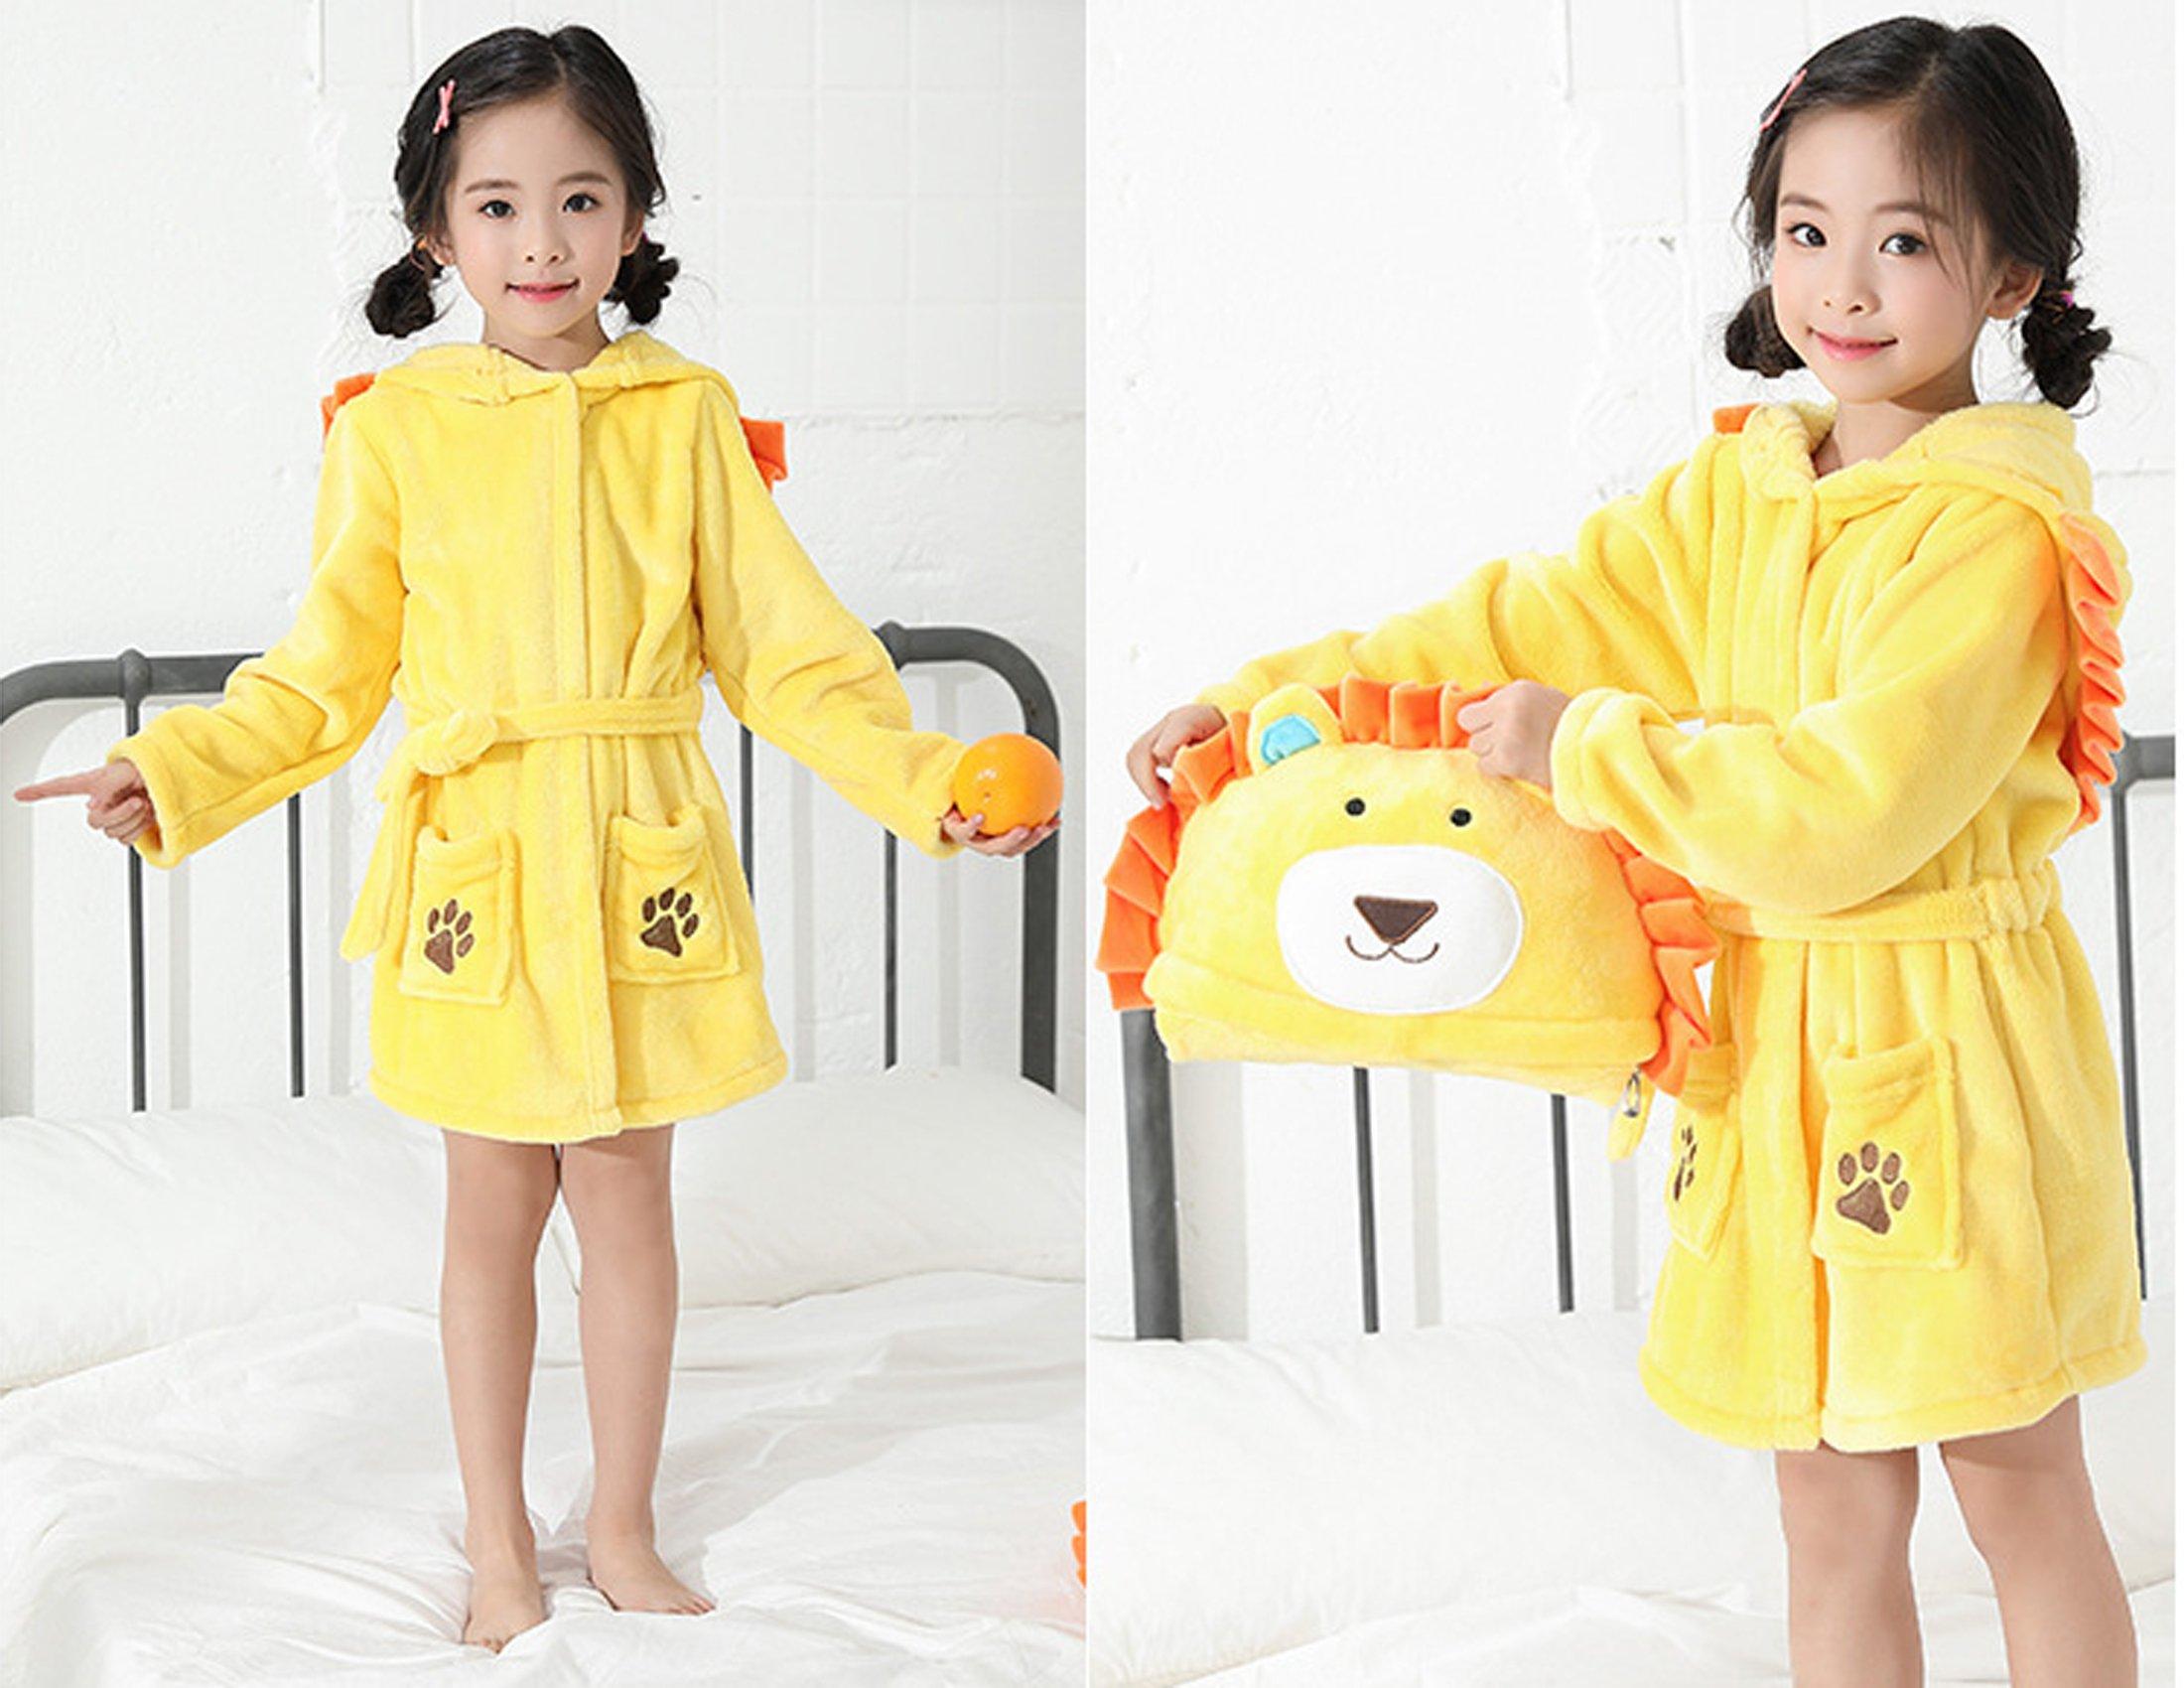 EPLAZA 3-6 Year Girl Boy Flannel Hooded Cute Animal Robe Sleepwear Kid Bathrobe Convertible Pillow (Tag 120, Yellow Lion) by EPLAZA (Image #4)